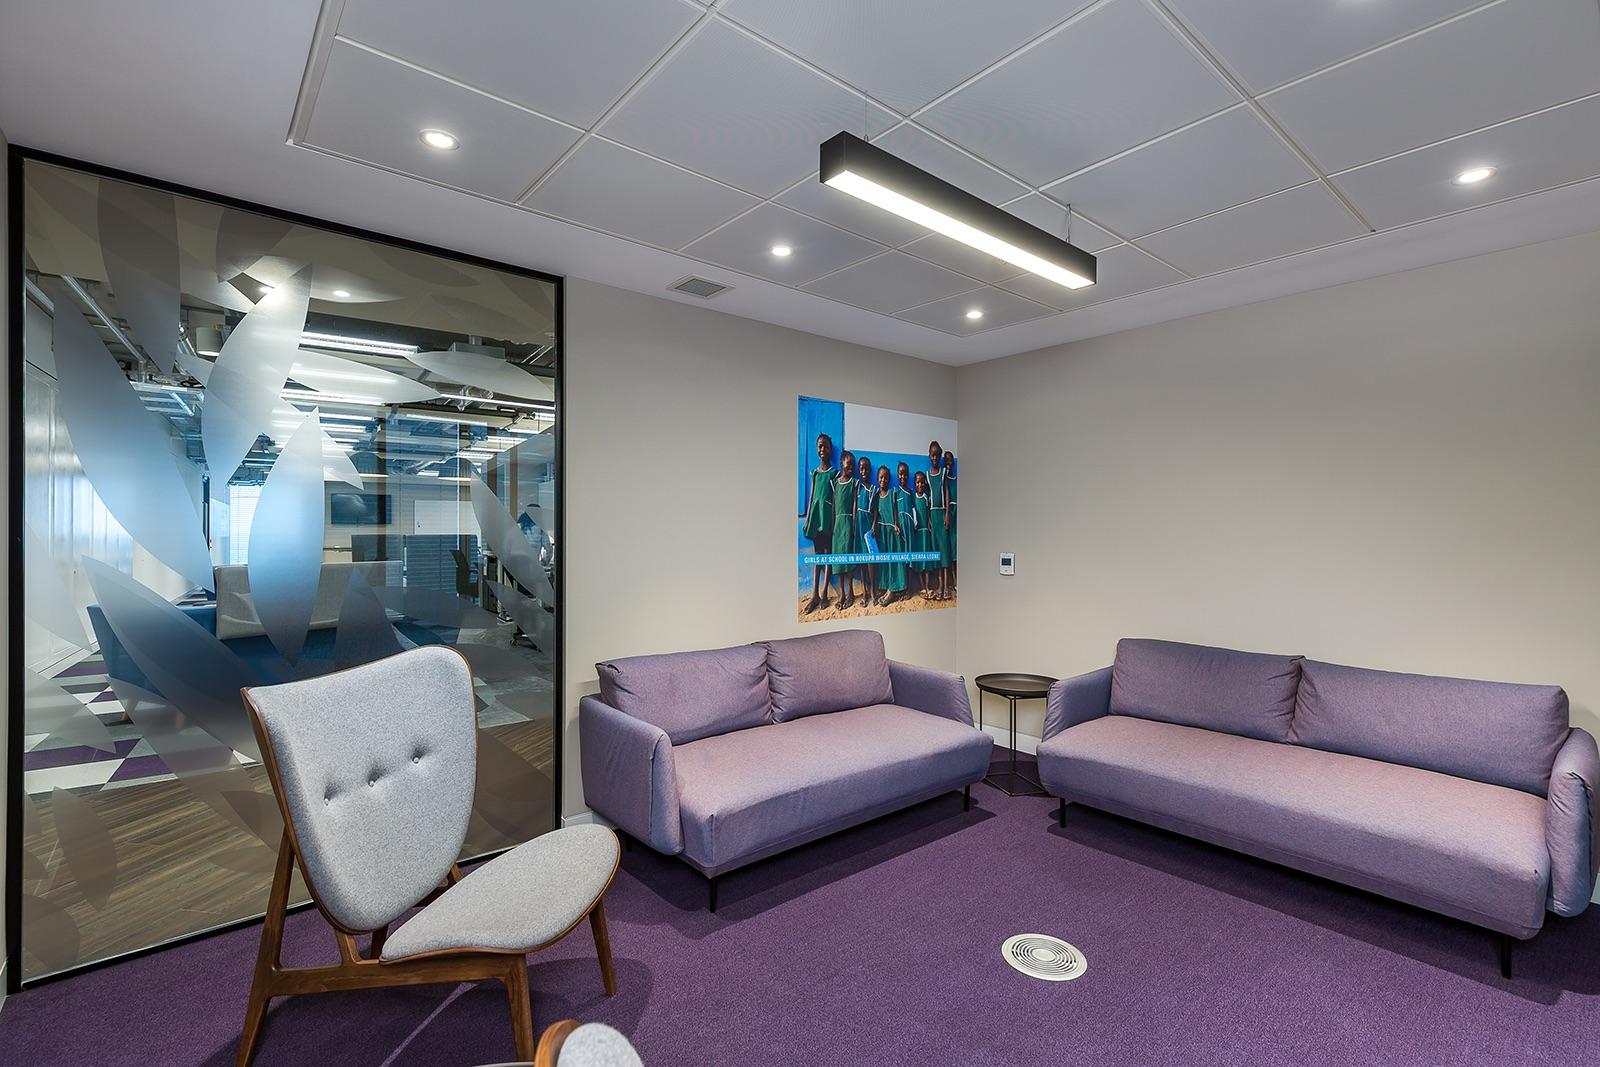 unicef-london-office-12